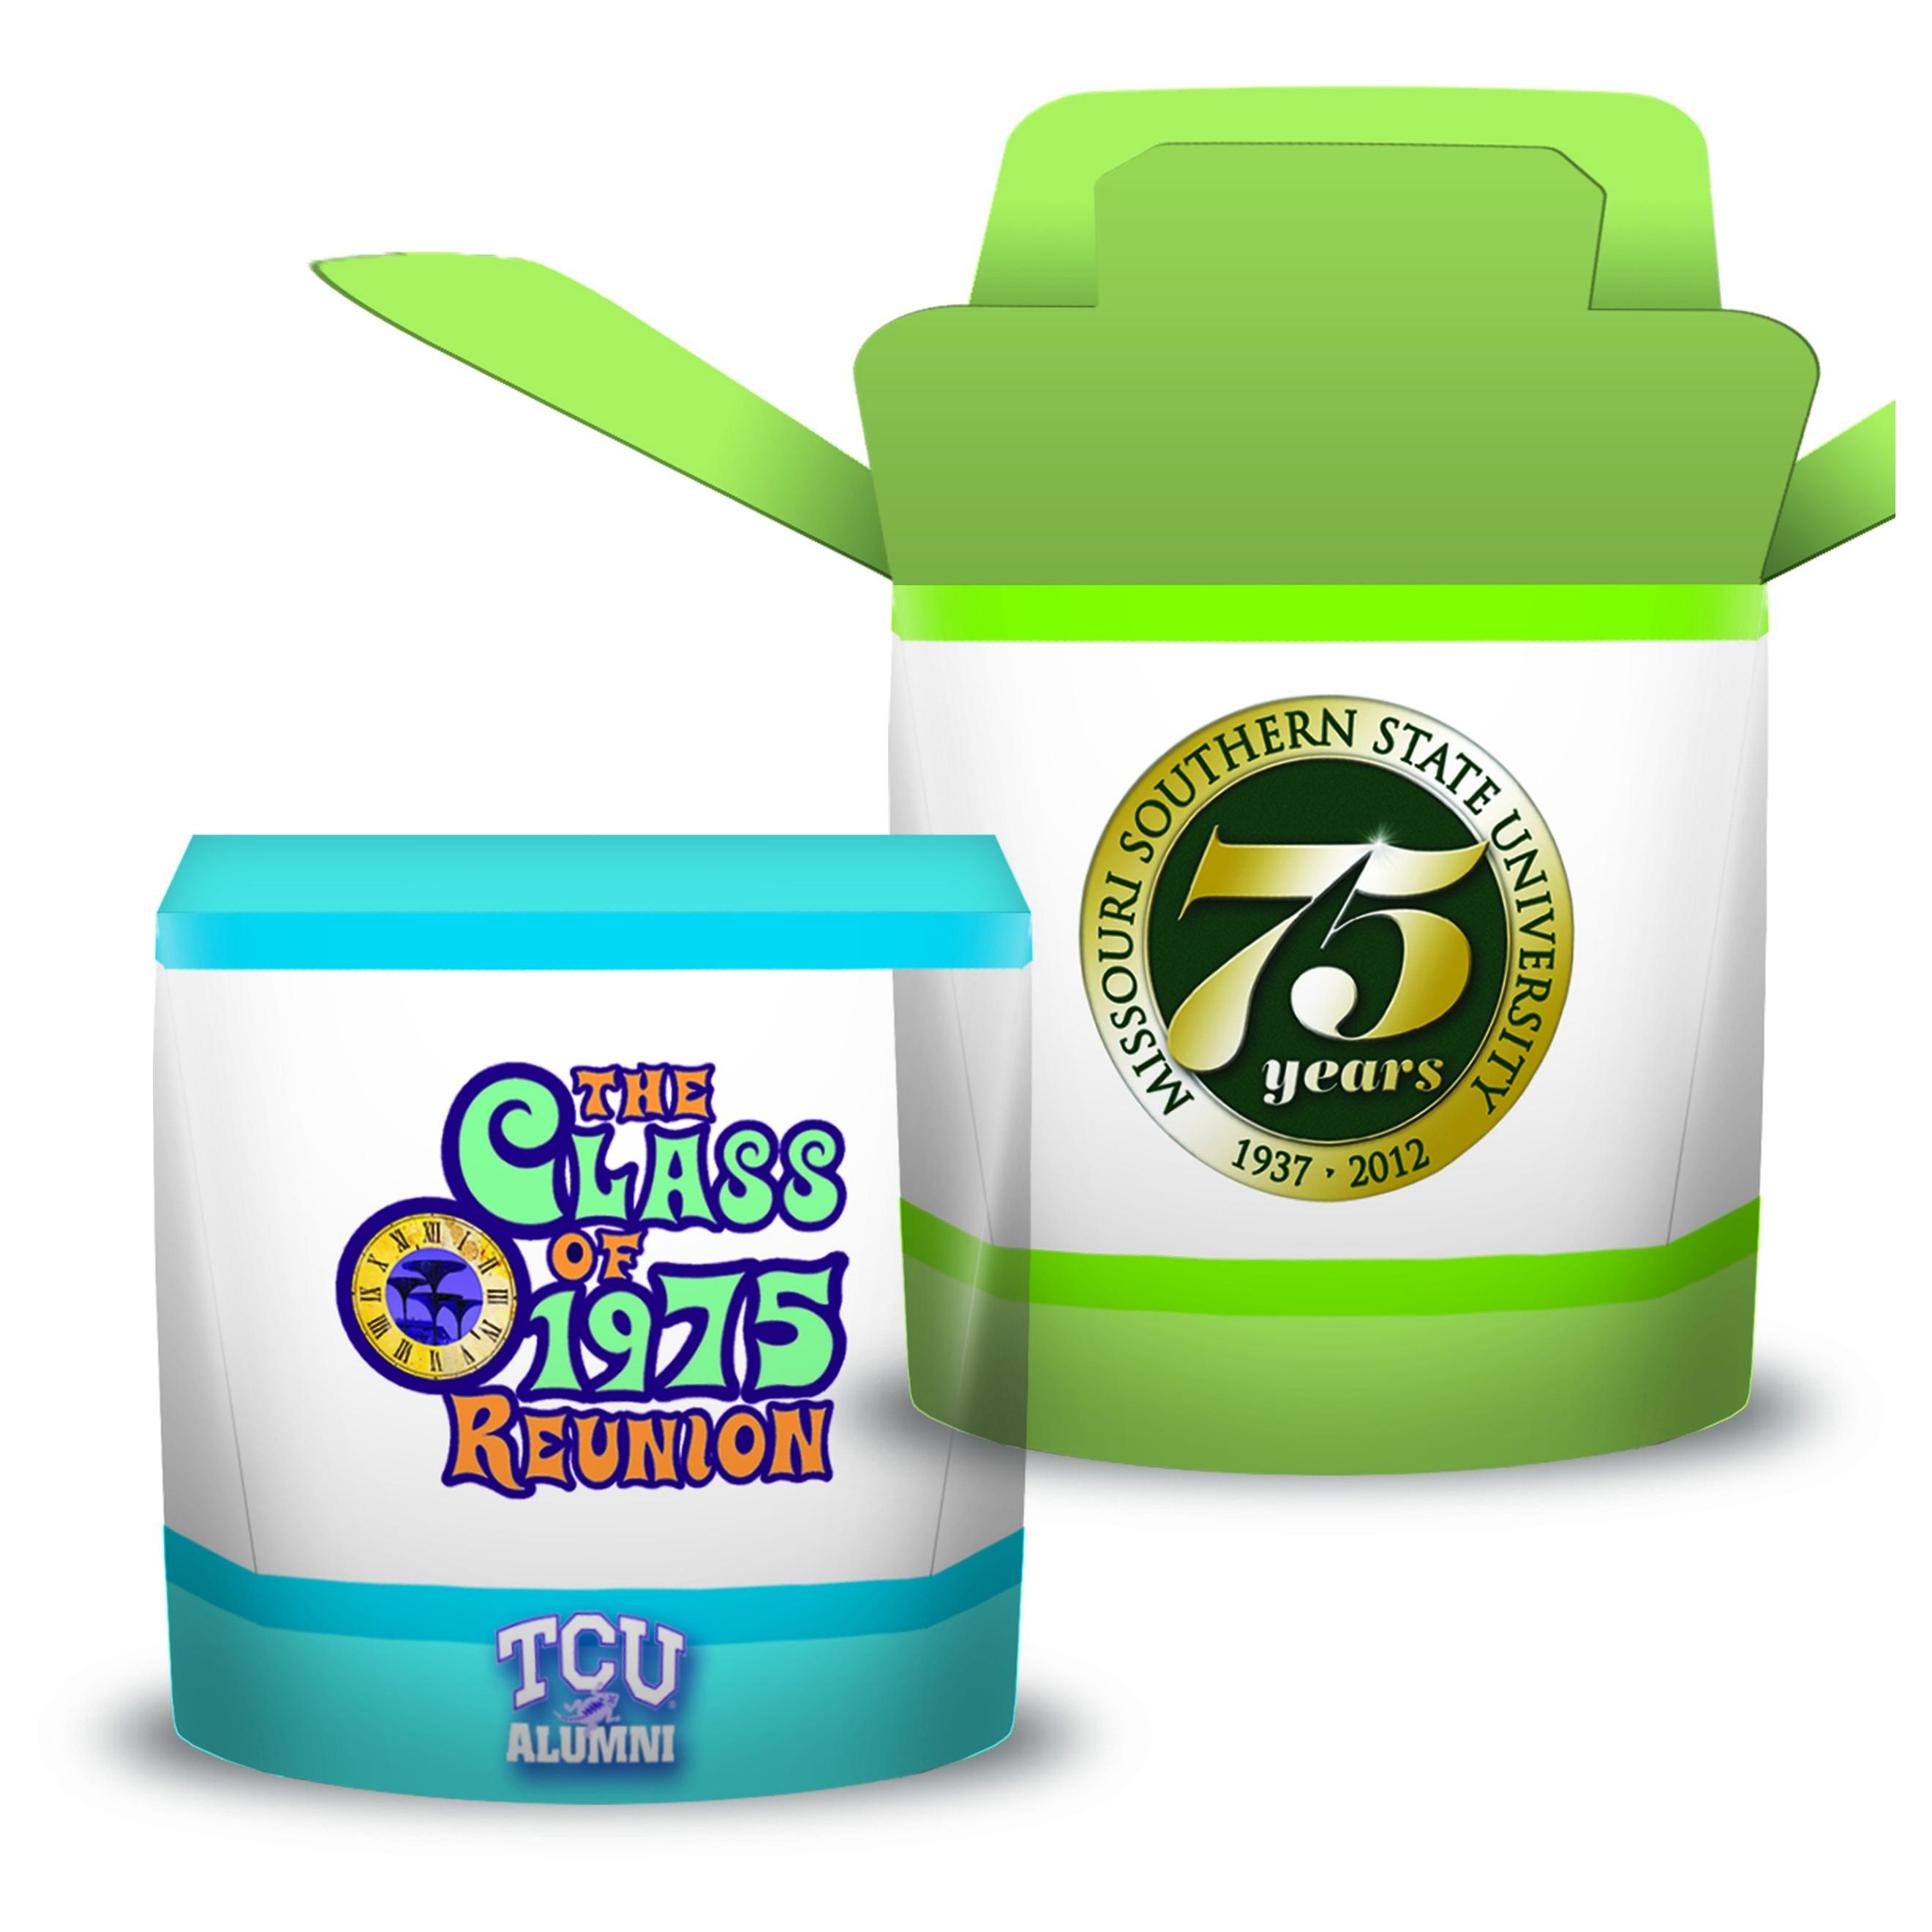 Visstun®-4oz-FoldTop® Gift Box Container-Full Color